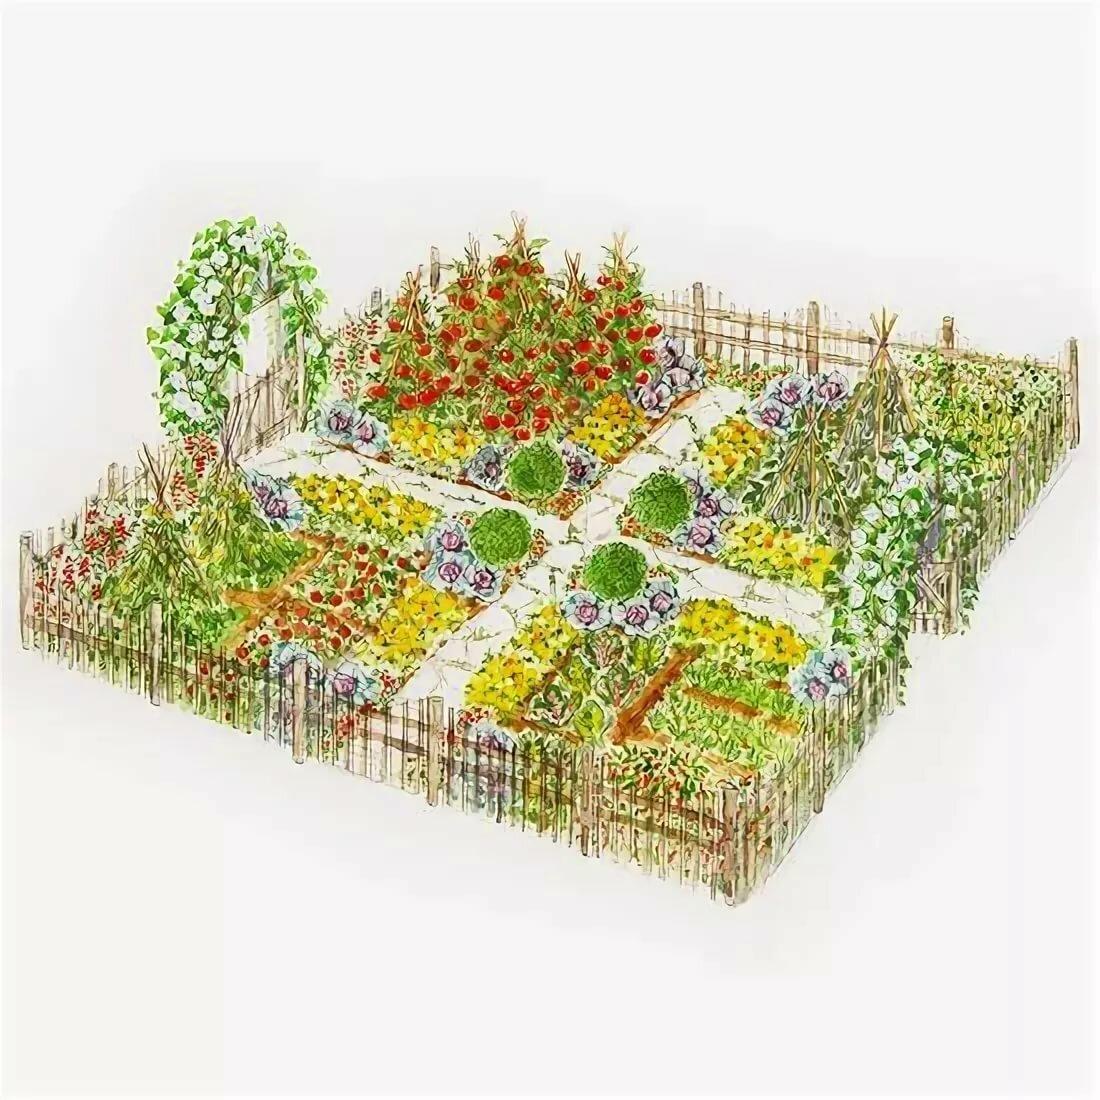 Анимация картинки огород на проспекте мира